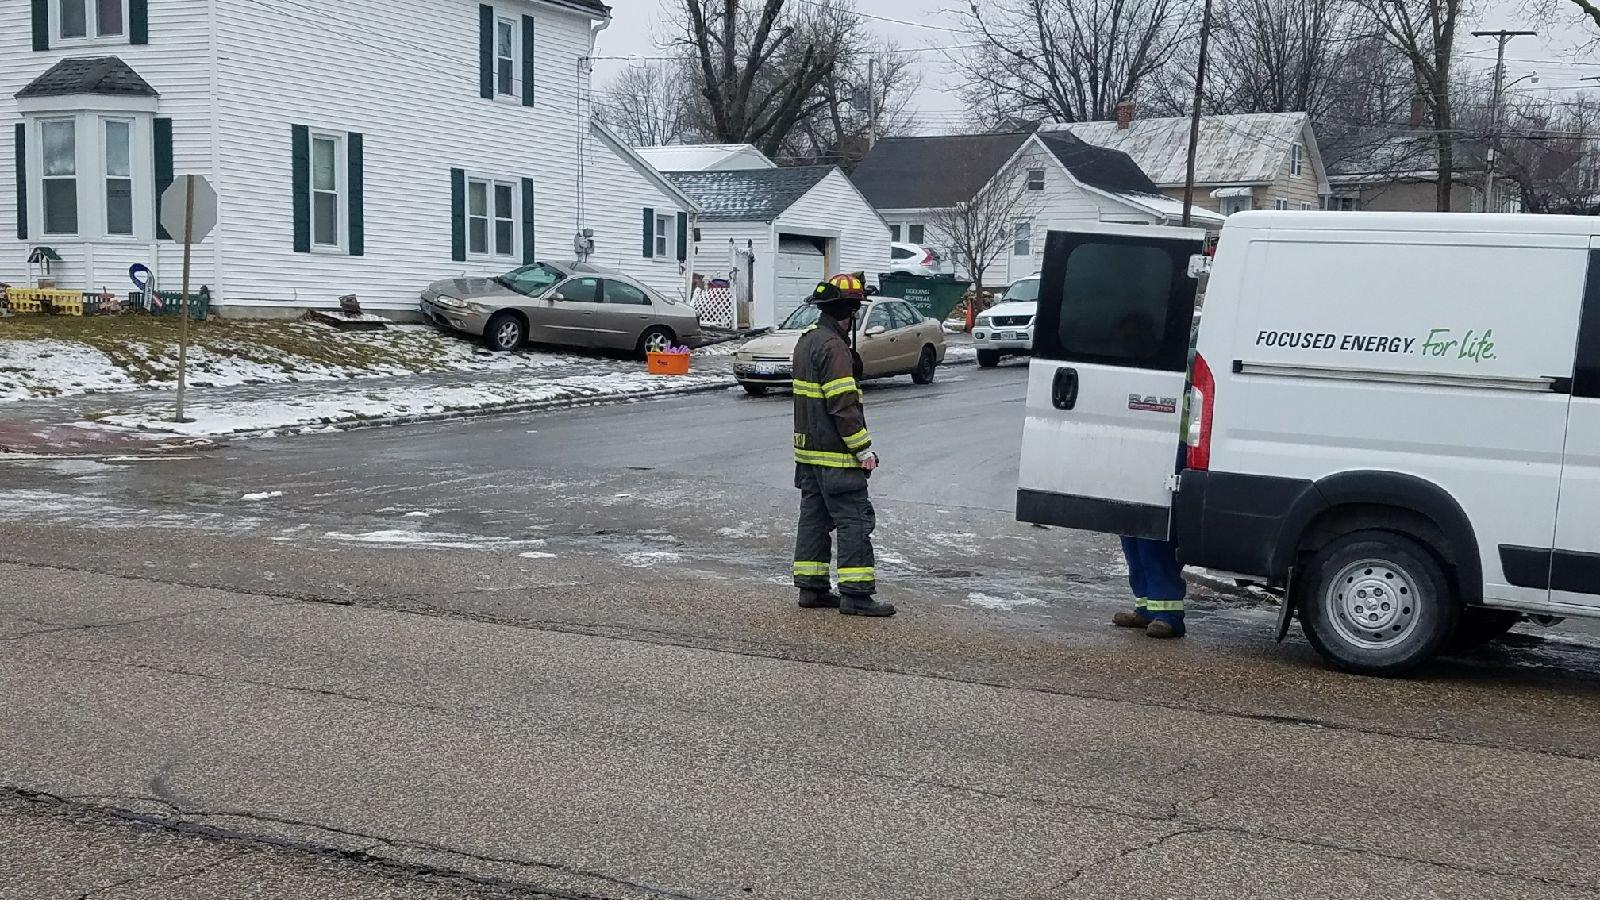 Ameren Illinois was also on scene.